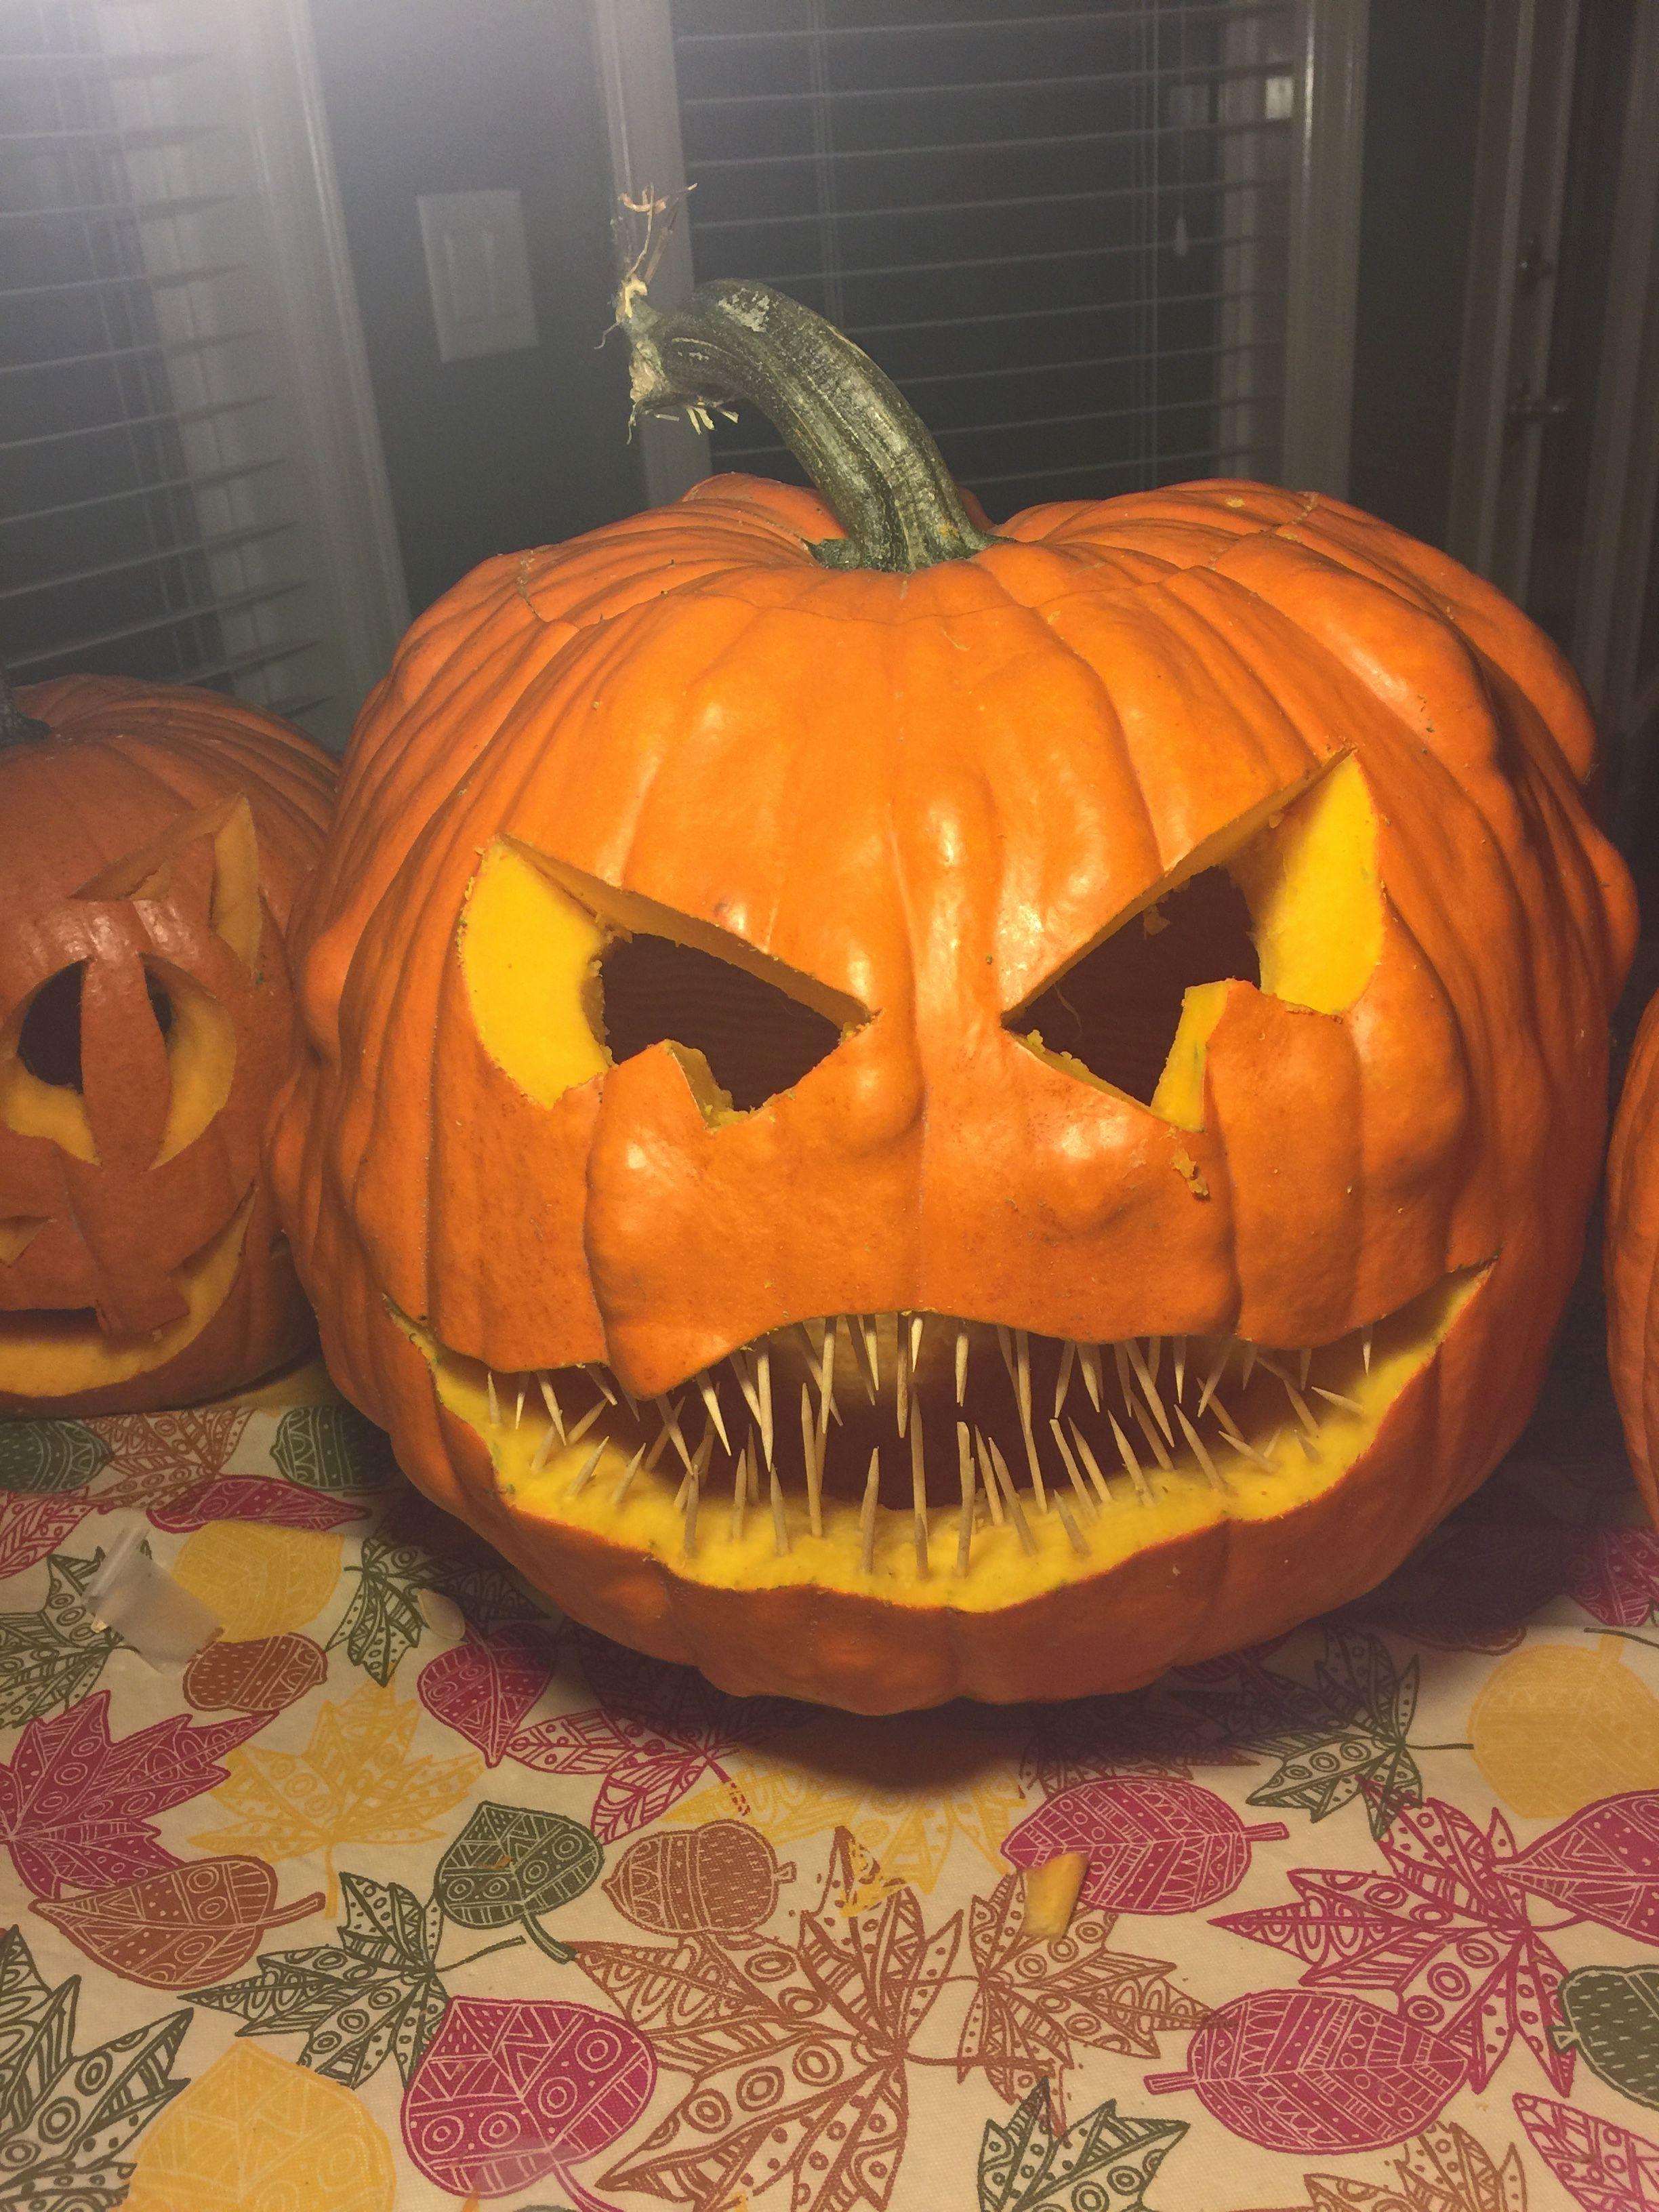 Easy Pumpkin Carving Idea Halloween Kurbis Schnitzen Halloween Ideen Kurbis Schnitzen Ideen